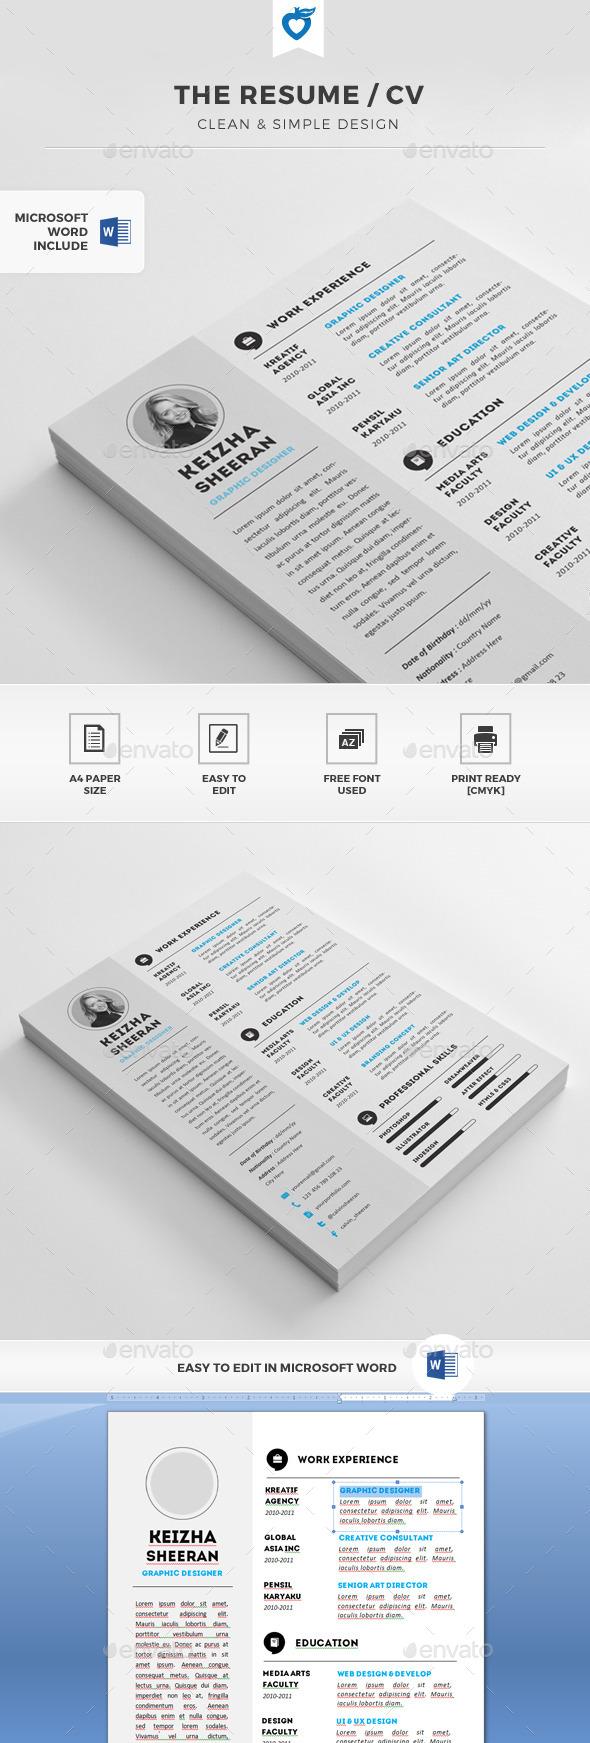 GraphicRiver The Resume CV 11408735